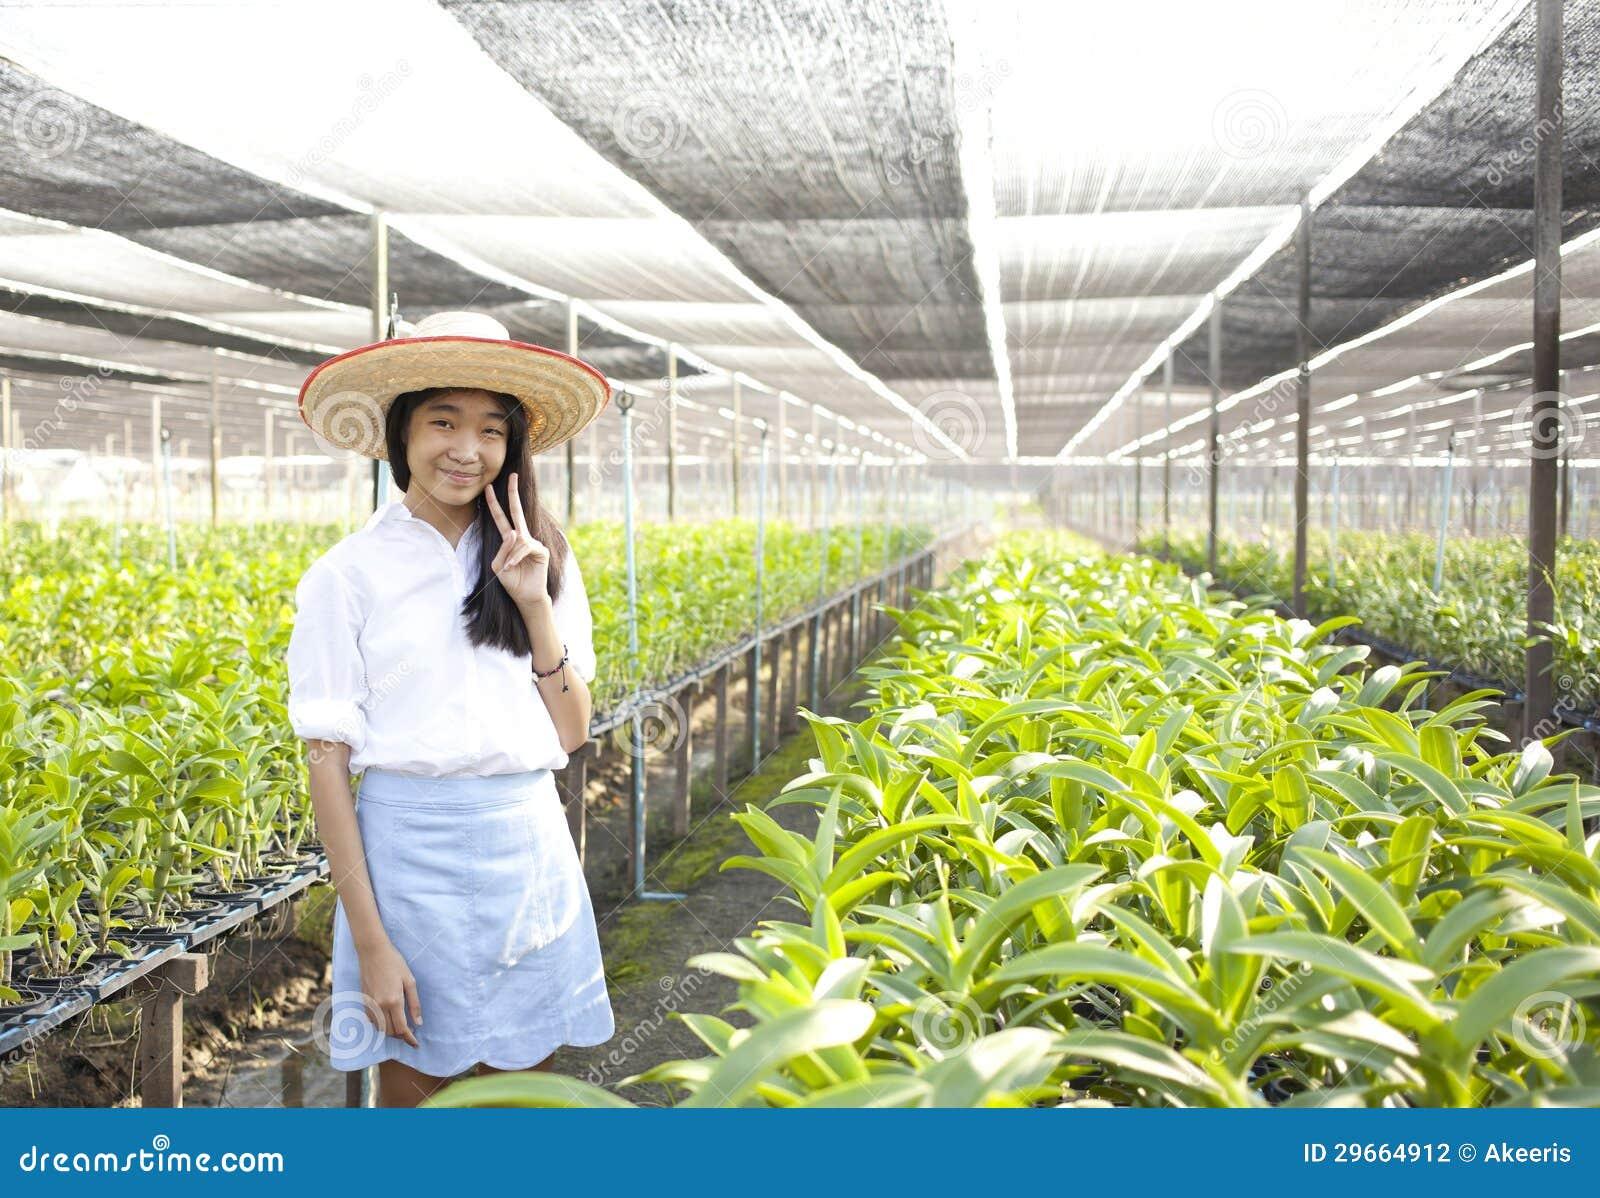 Tobacco Farm Owner Debarred From H-2A Visa Program